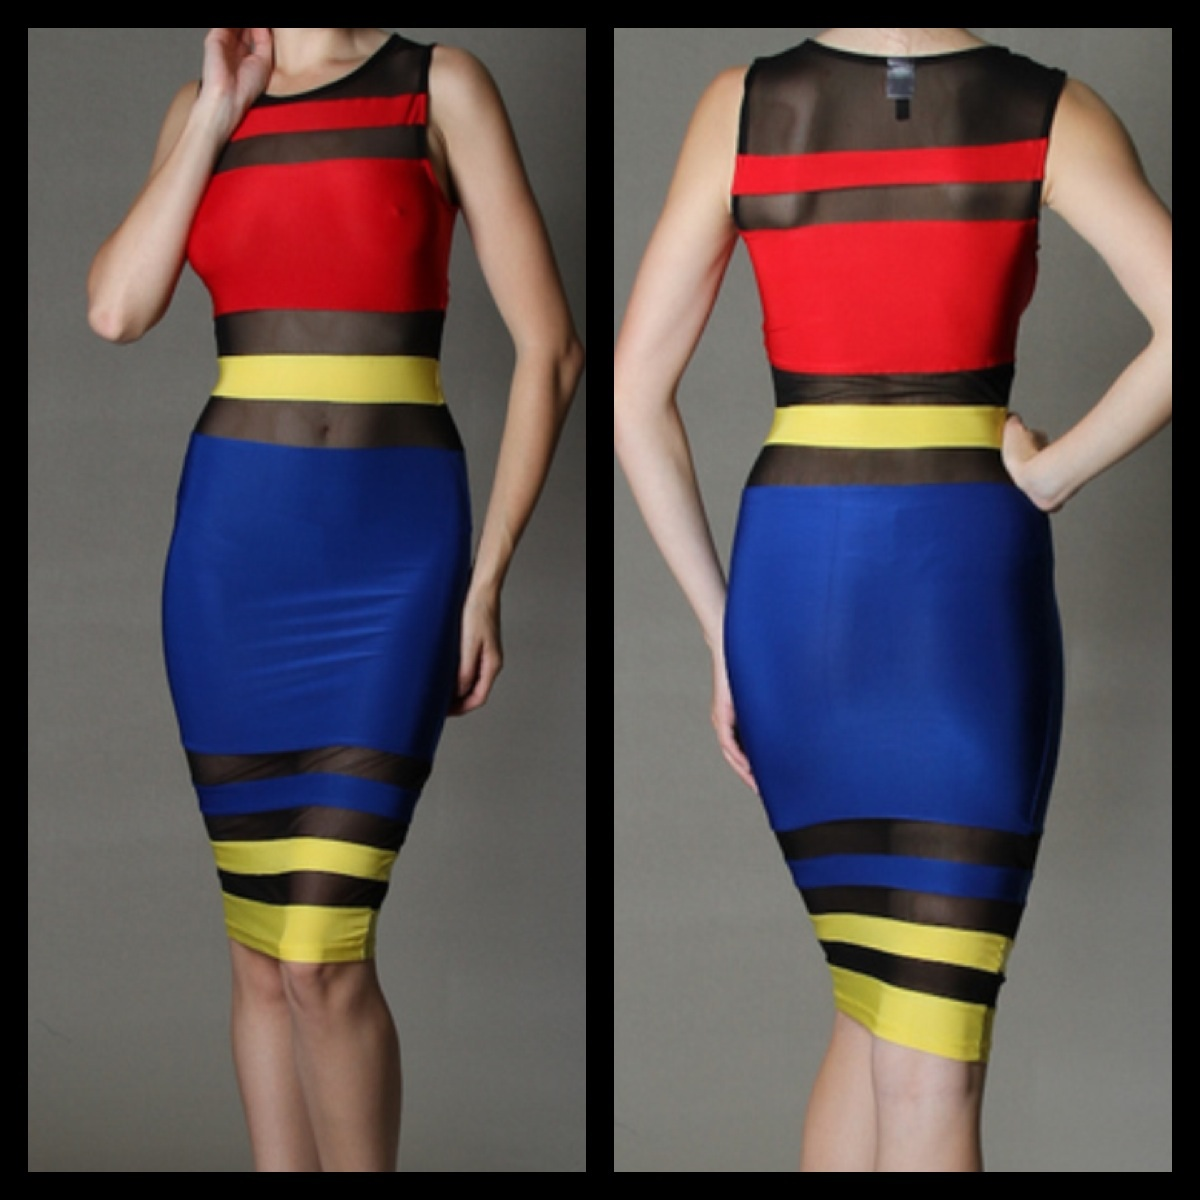 Elite radiance primary color block mesh dress online store powered